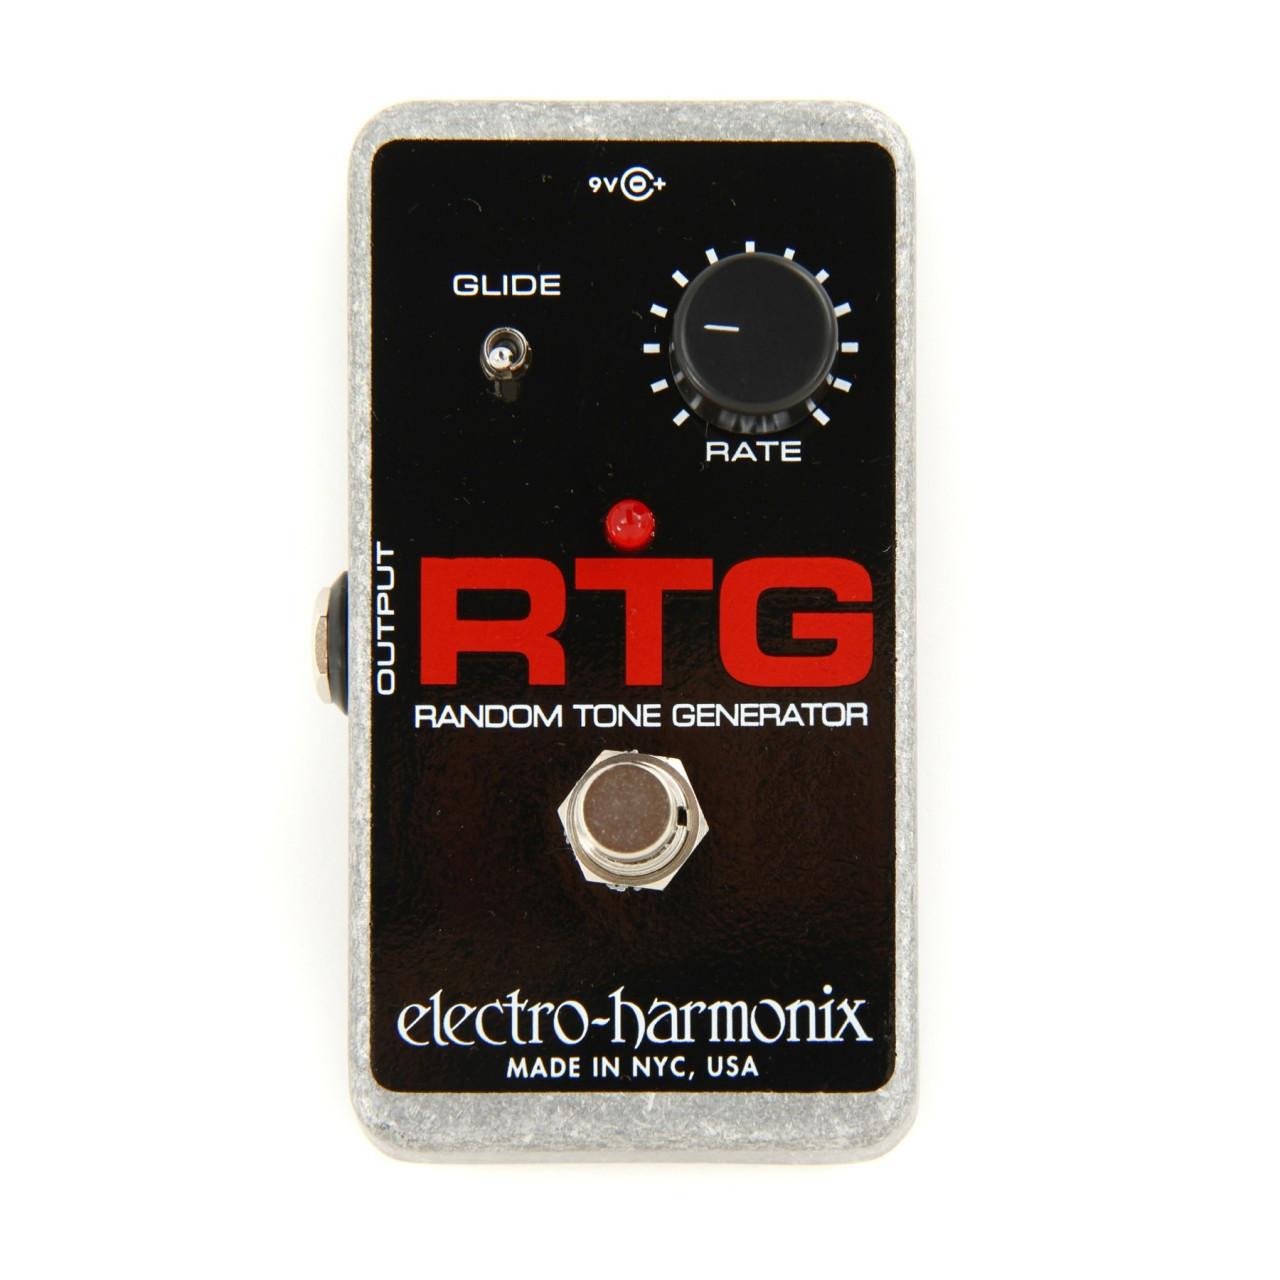 Electro-Harmonix Random Tone Generator by Electro-Harmonix